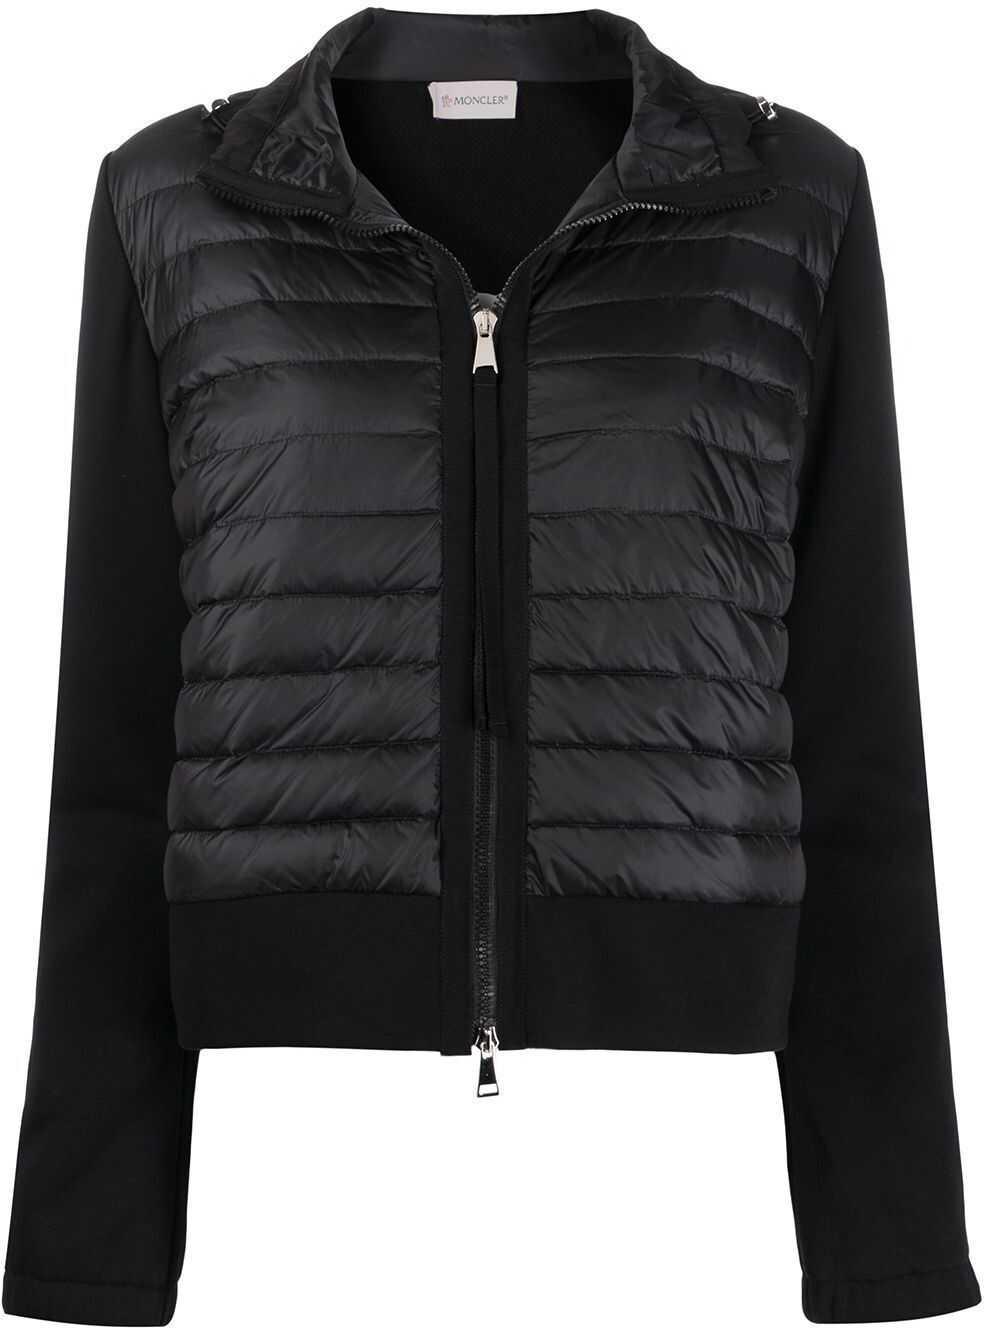 Moncler Cotton Outerwear Jacket BLACK